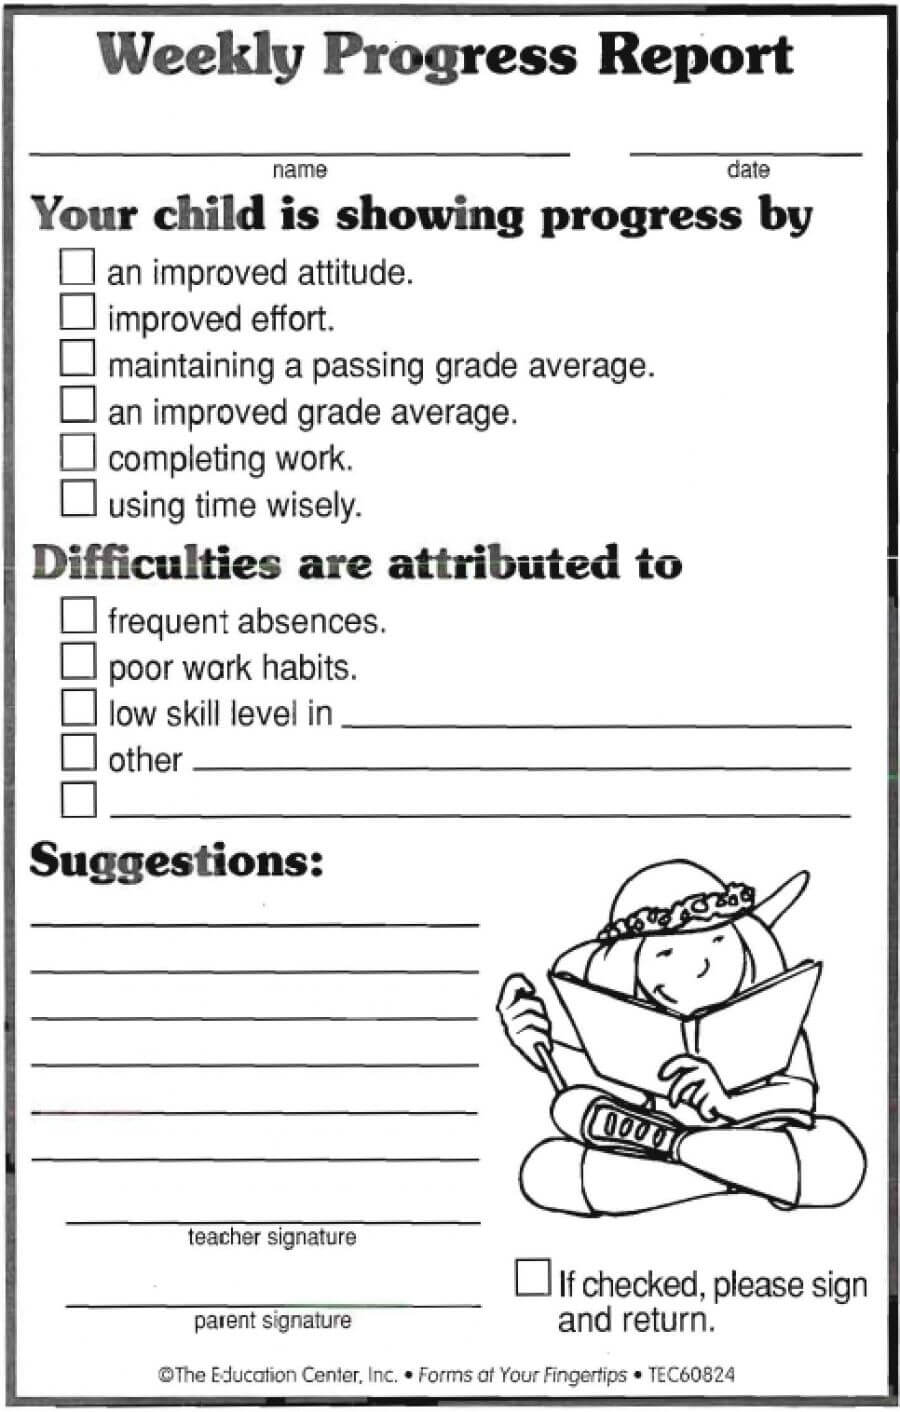 Weekly Progress Report | Progress Report, Progress Report inside Pupil Report Template